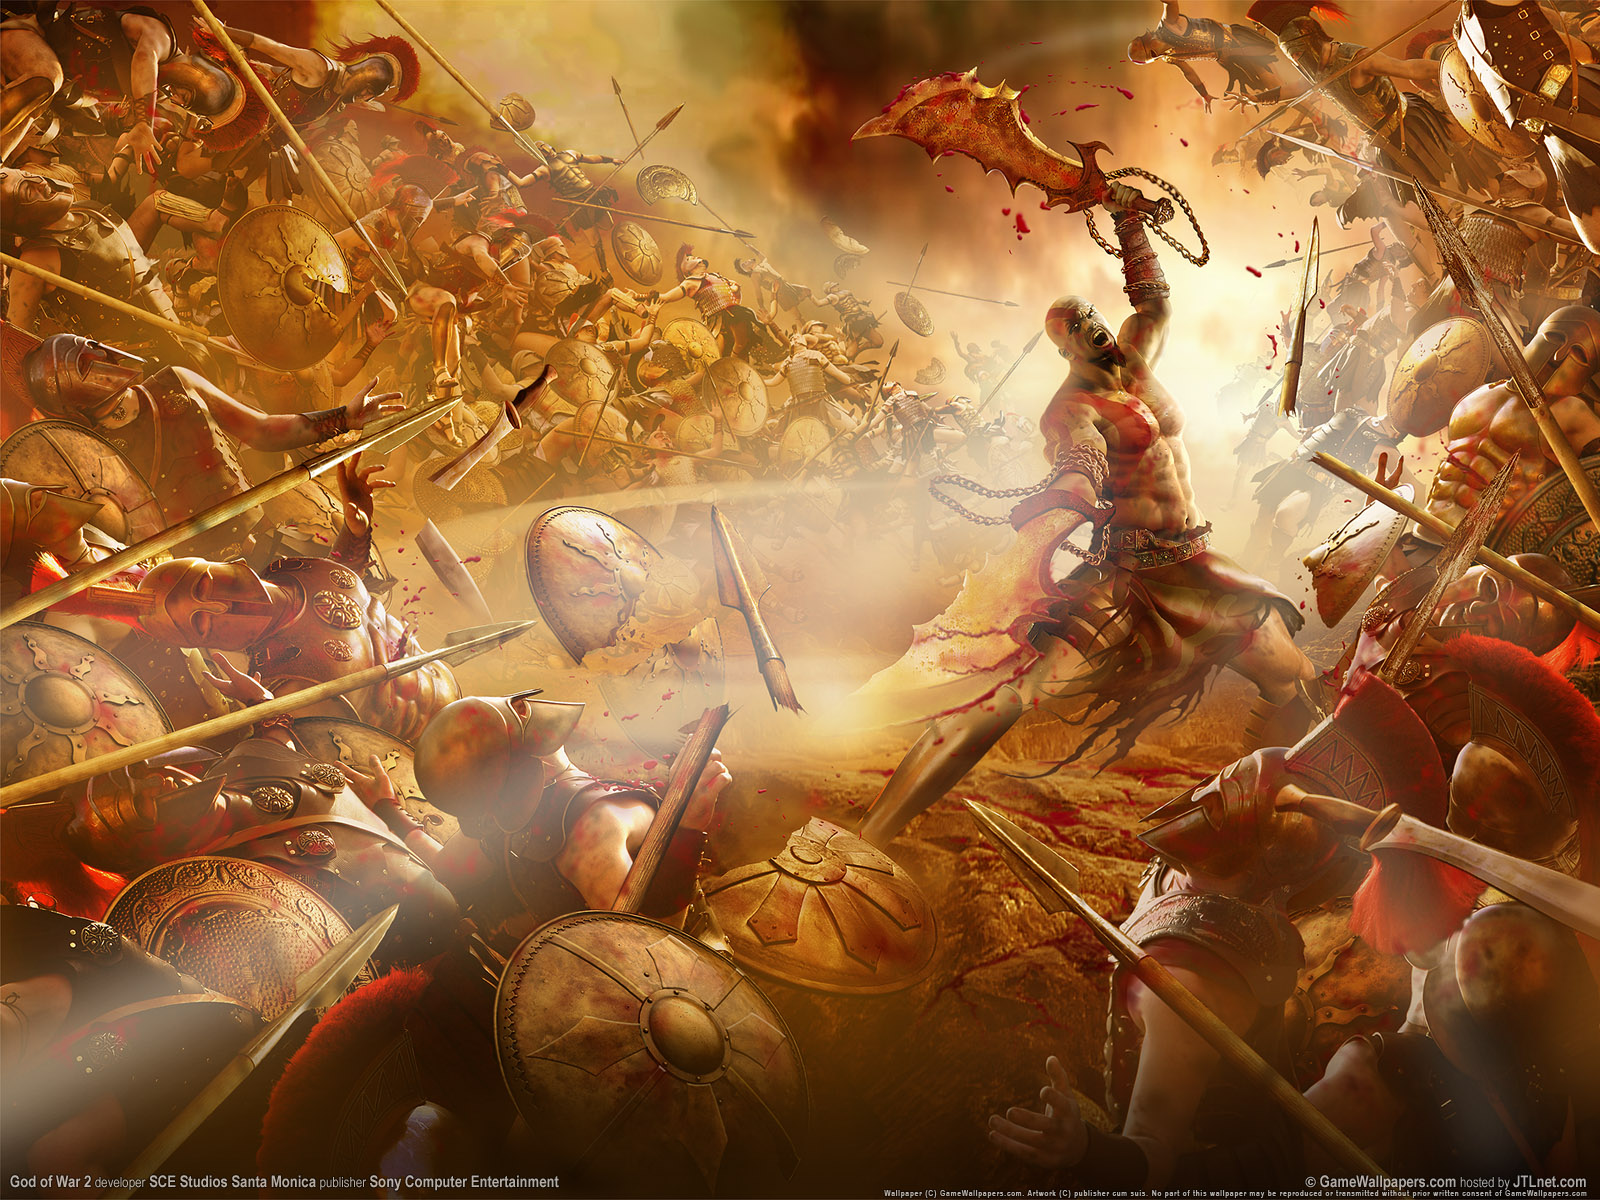 Free Download God War 2 Wallpaper Kratos Wallpaper Games 02